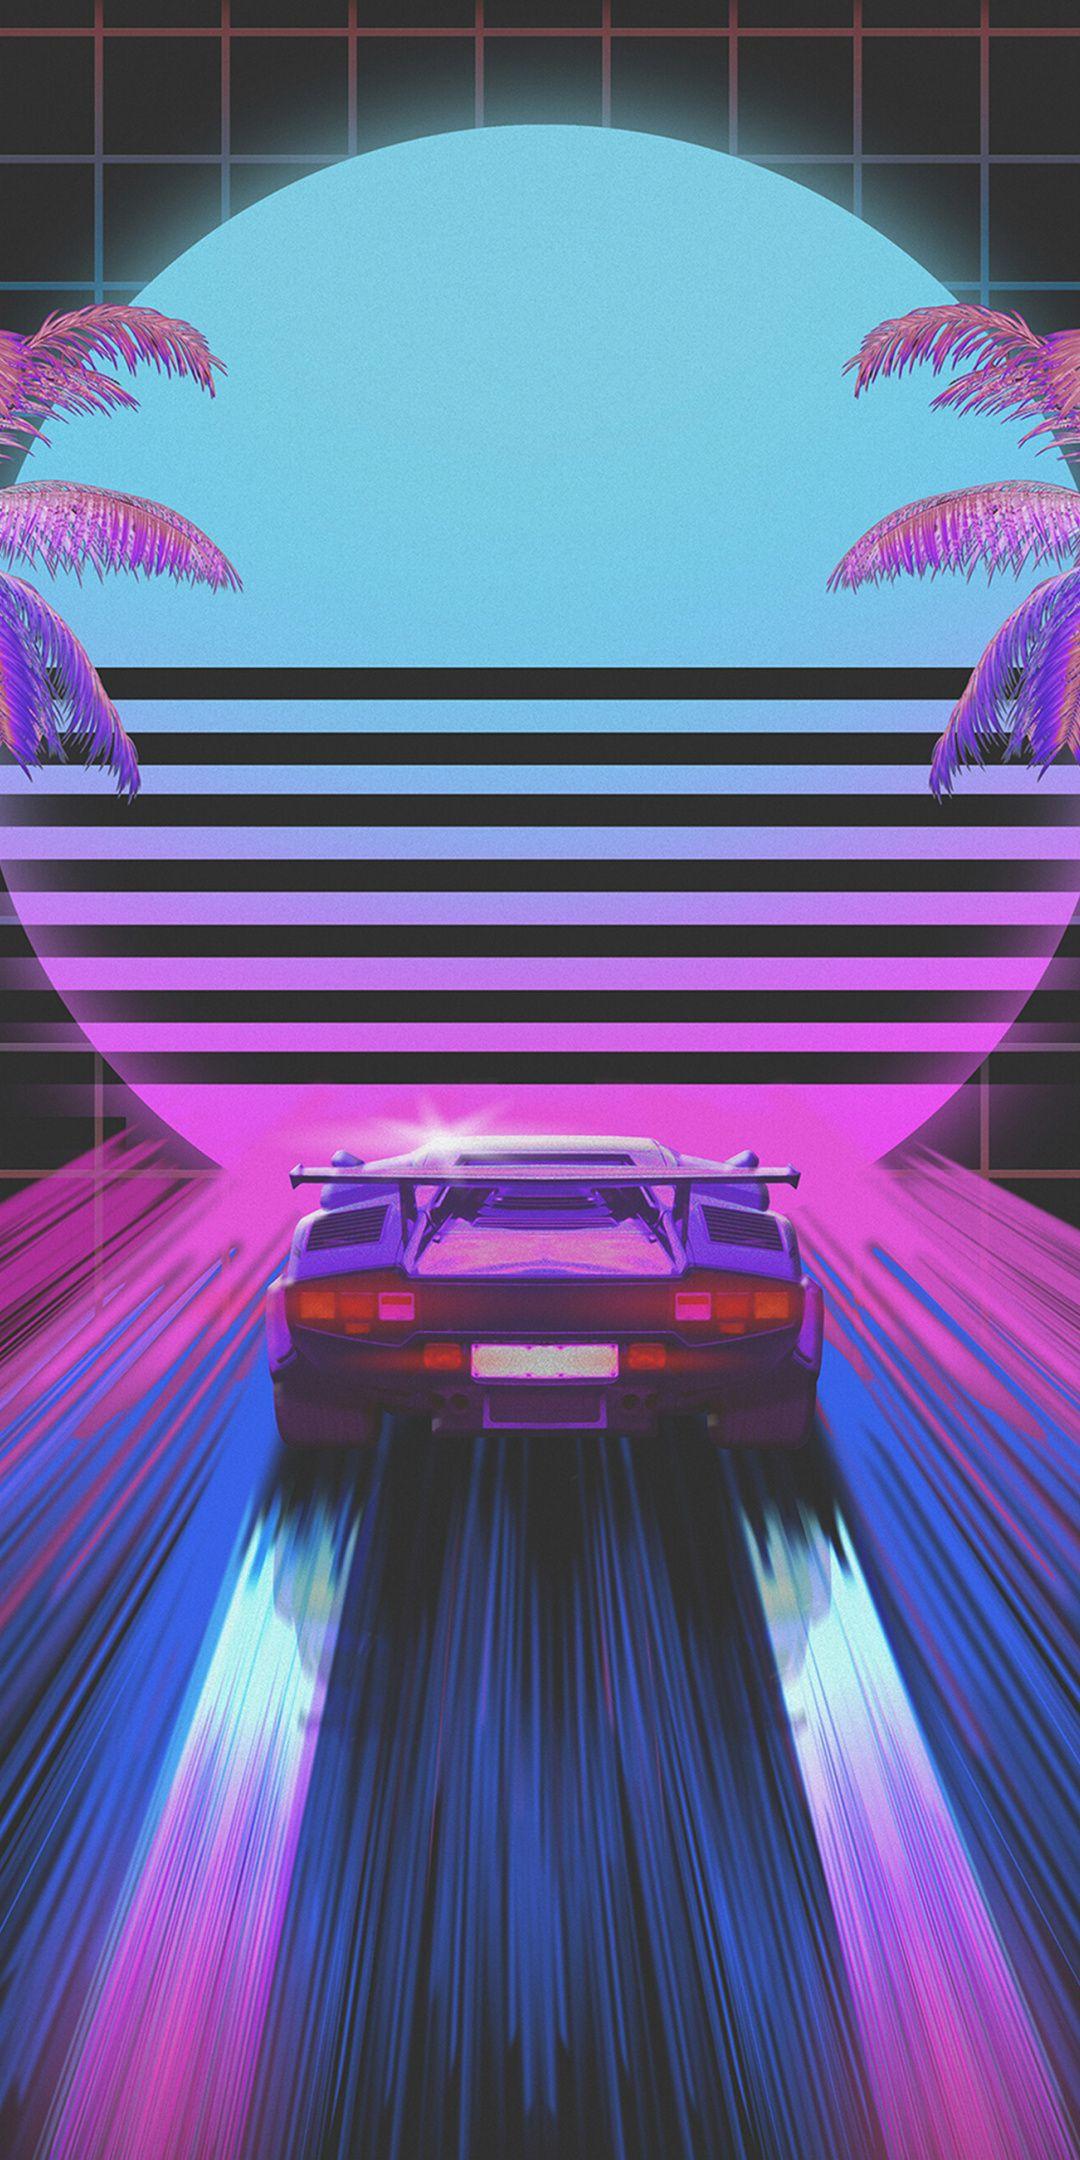 Classic Car Retro Art Wallpaper Vaporwave Wallpaper Neon Wallpaper Retro Wallpaper